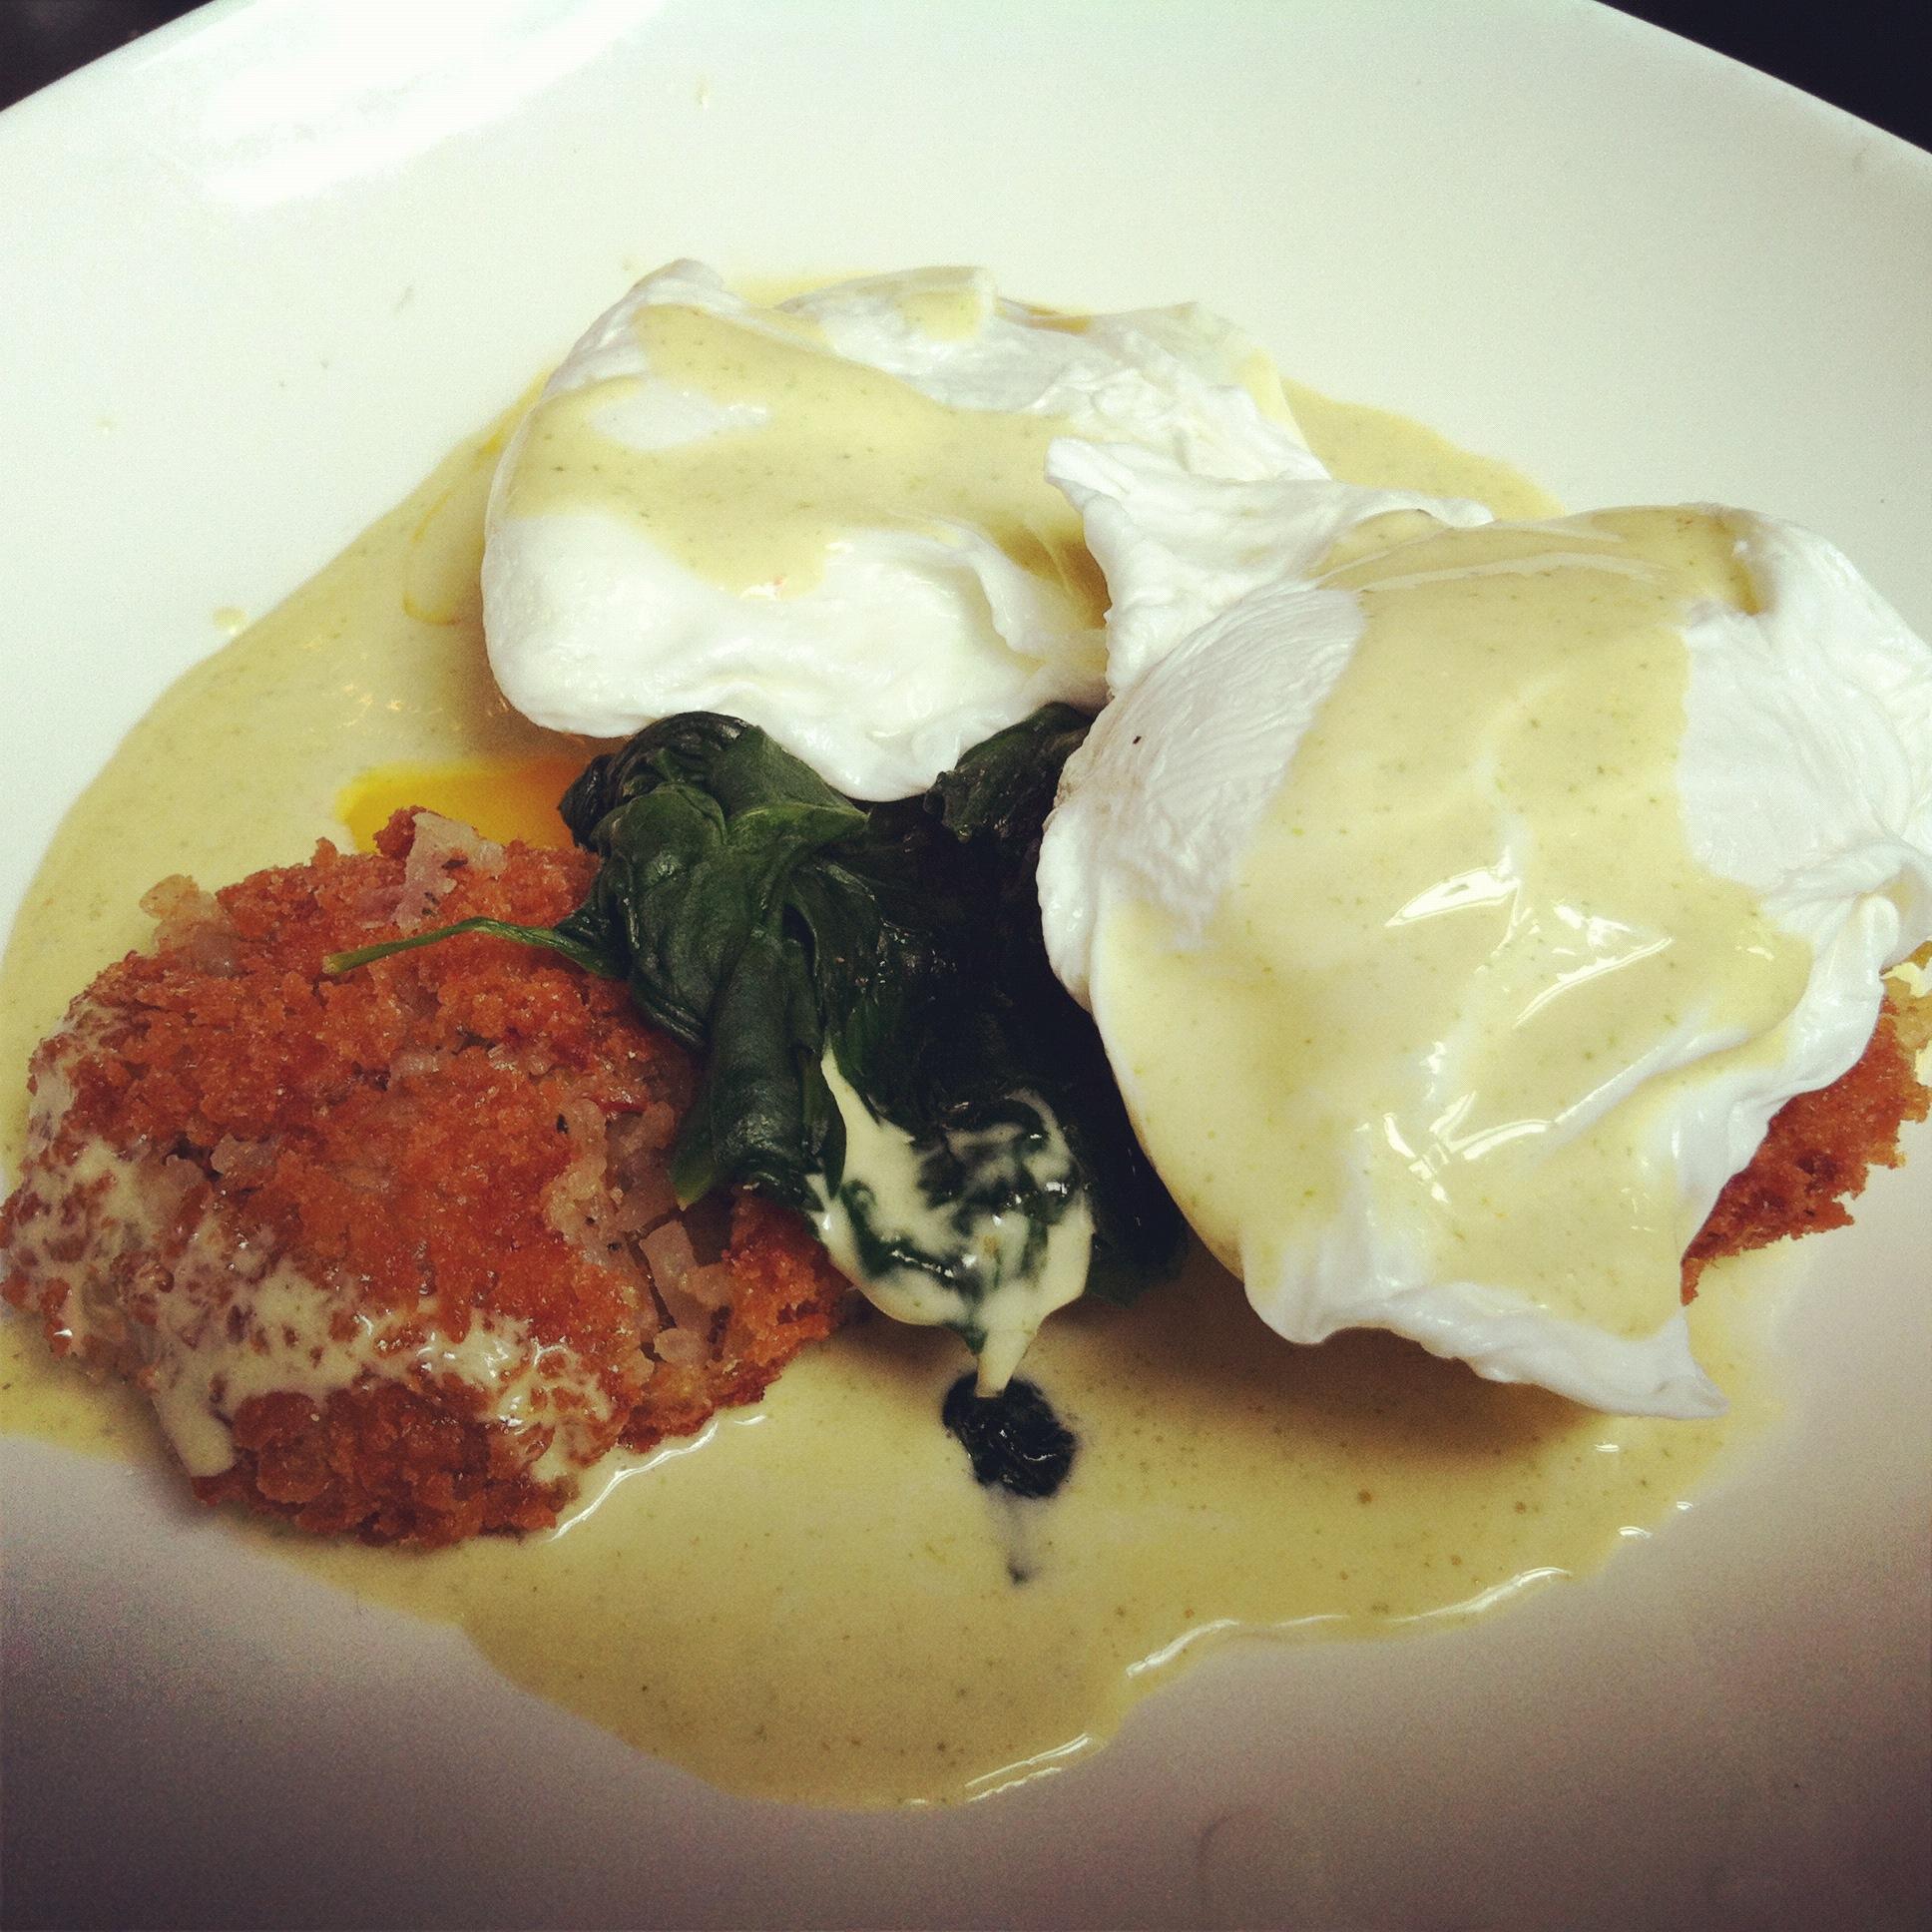 Crawfish benedict! 2 poached eggs, crawfish, artichoke hash spinach ...